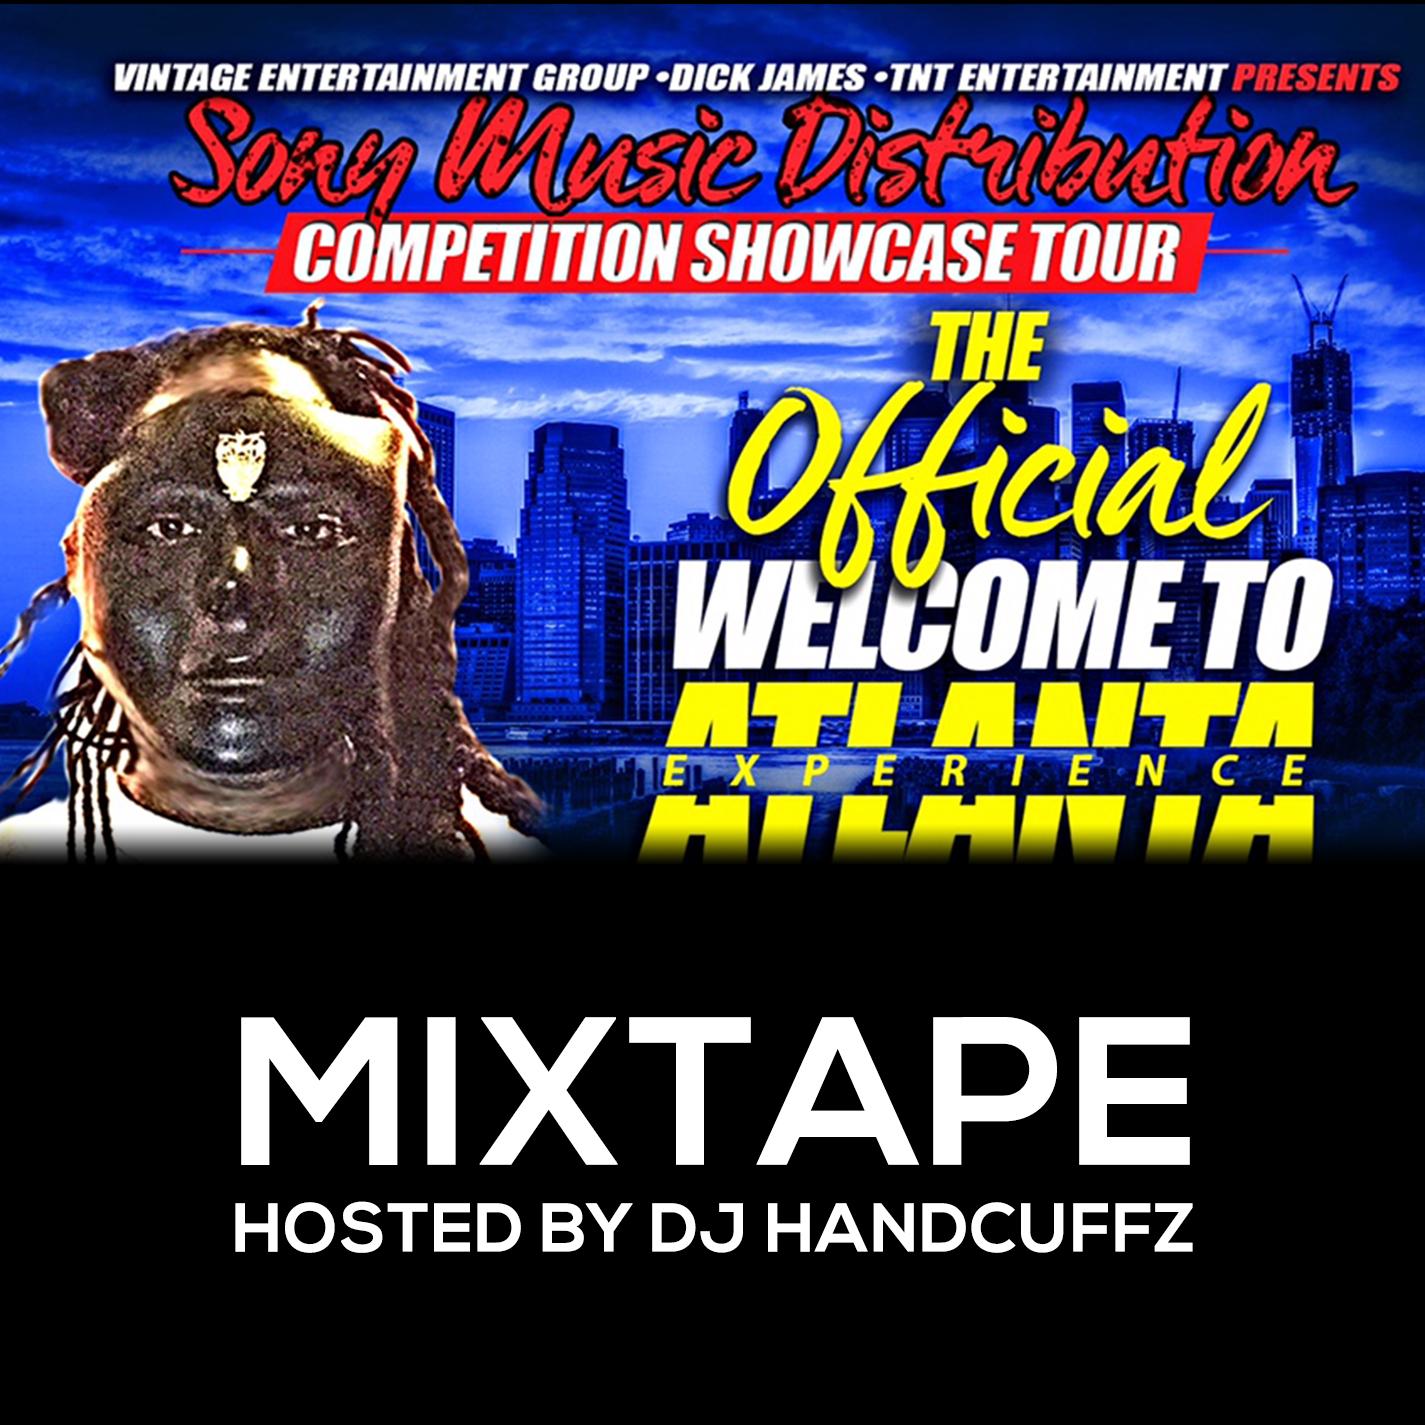 Atlanta Sony Music Contest Dick James Artist Mixtape